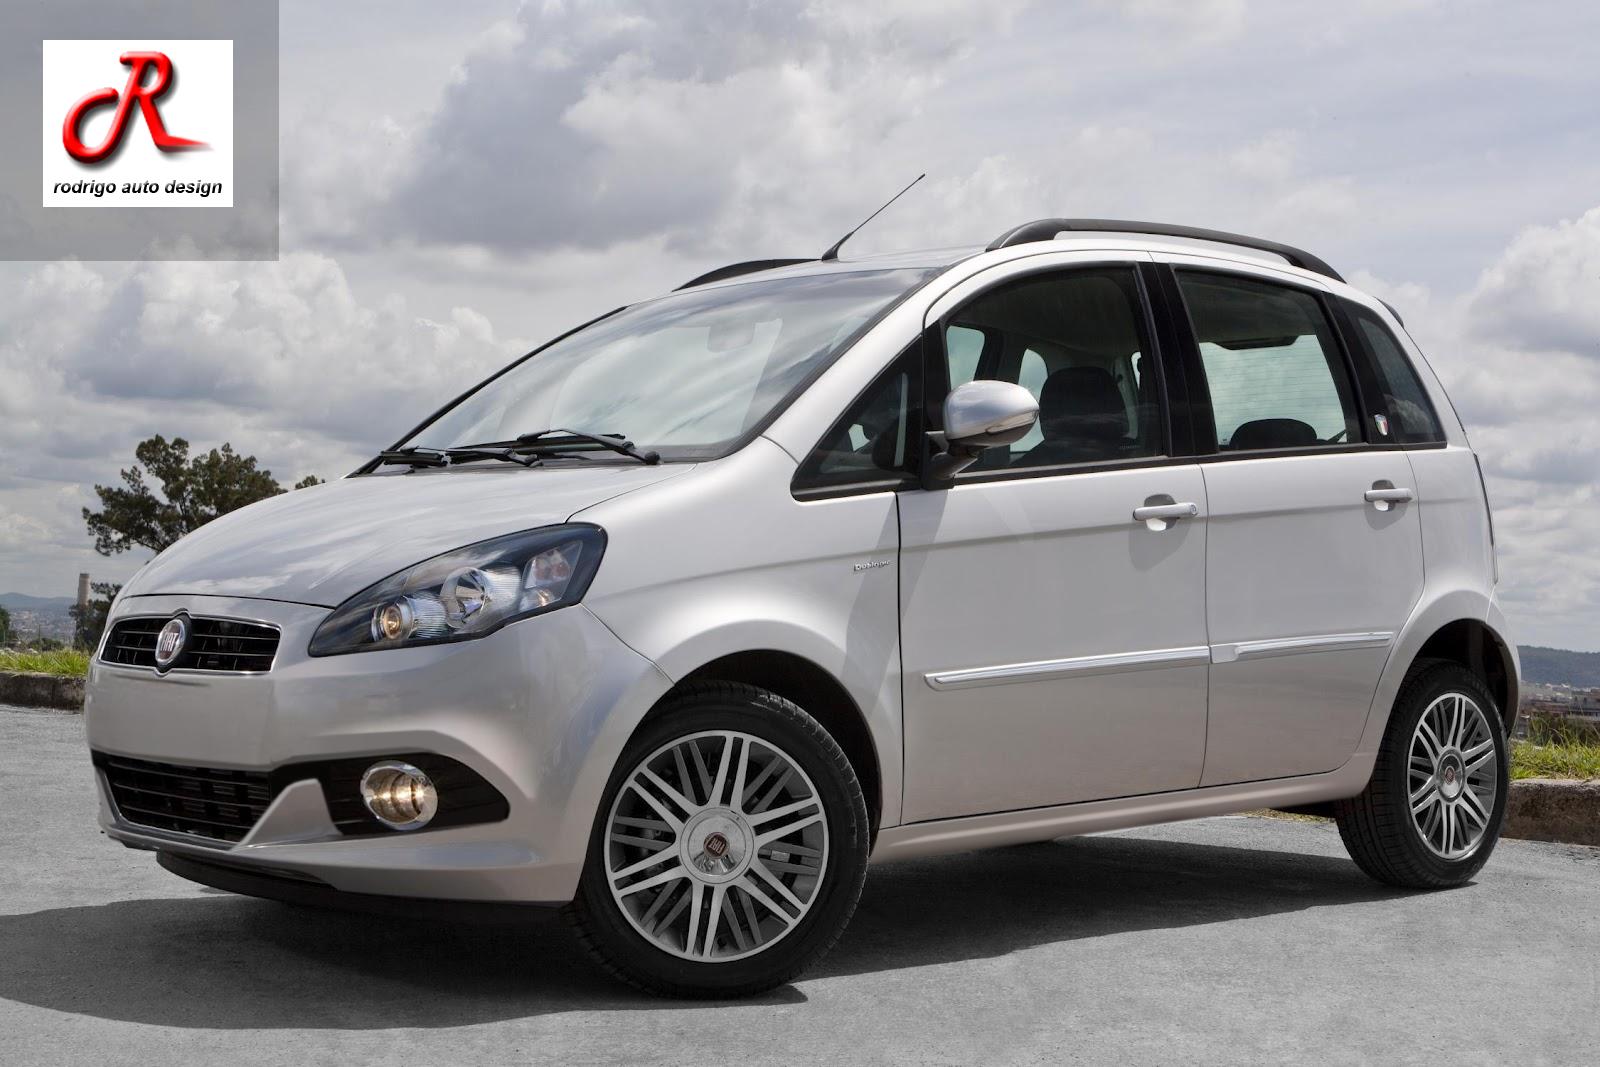 Rodrigo auto Design: Nova Fiat Idea 2014